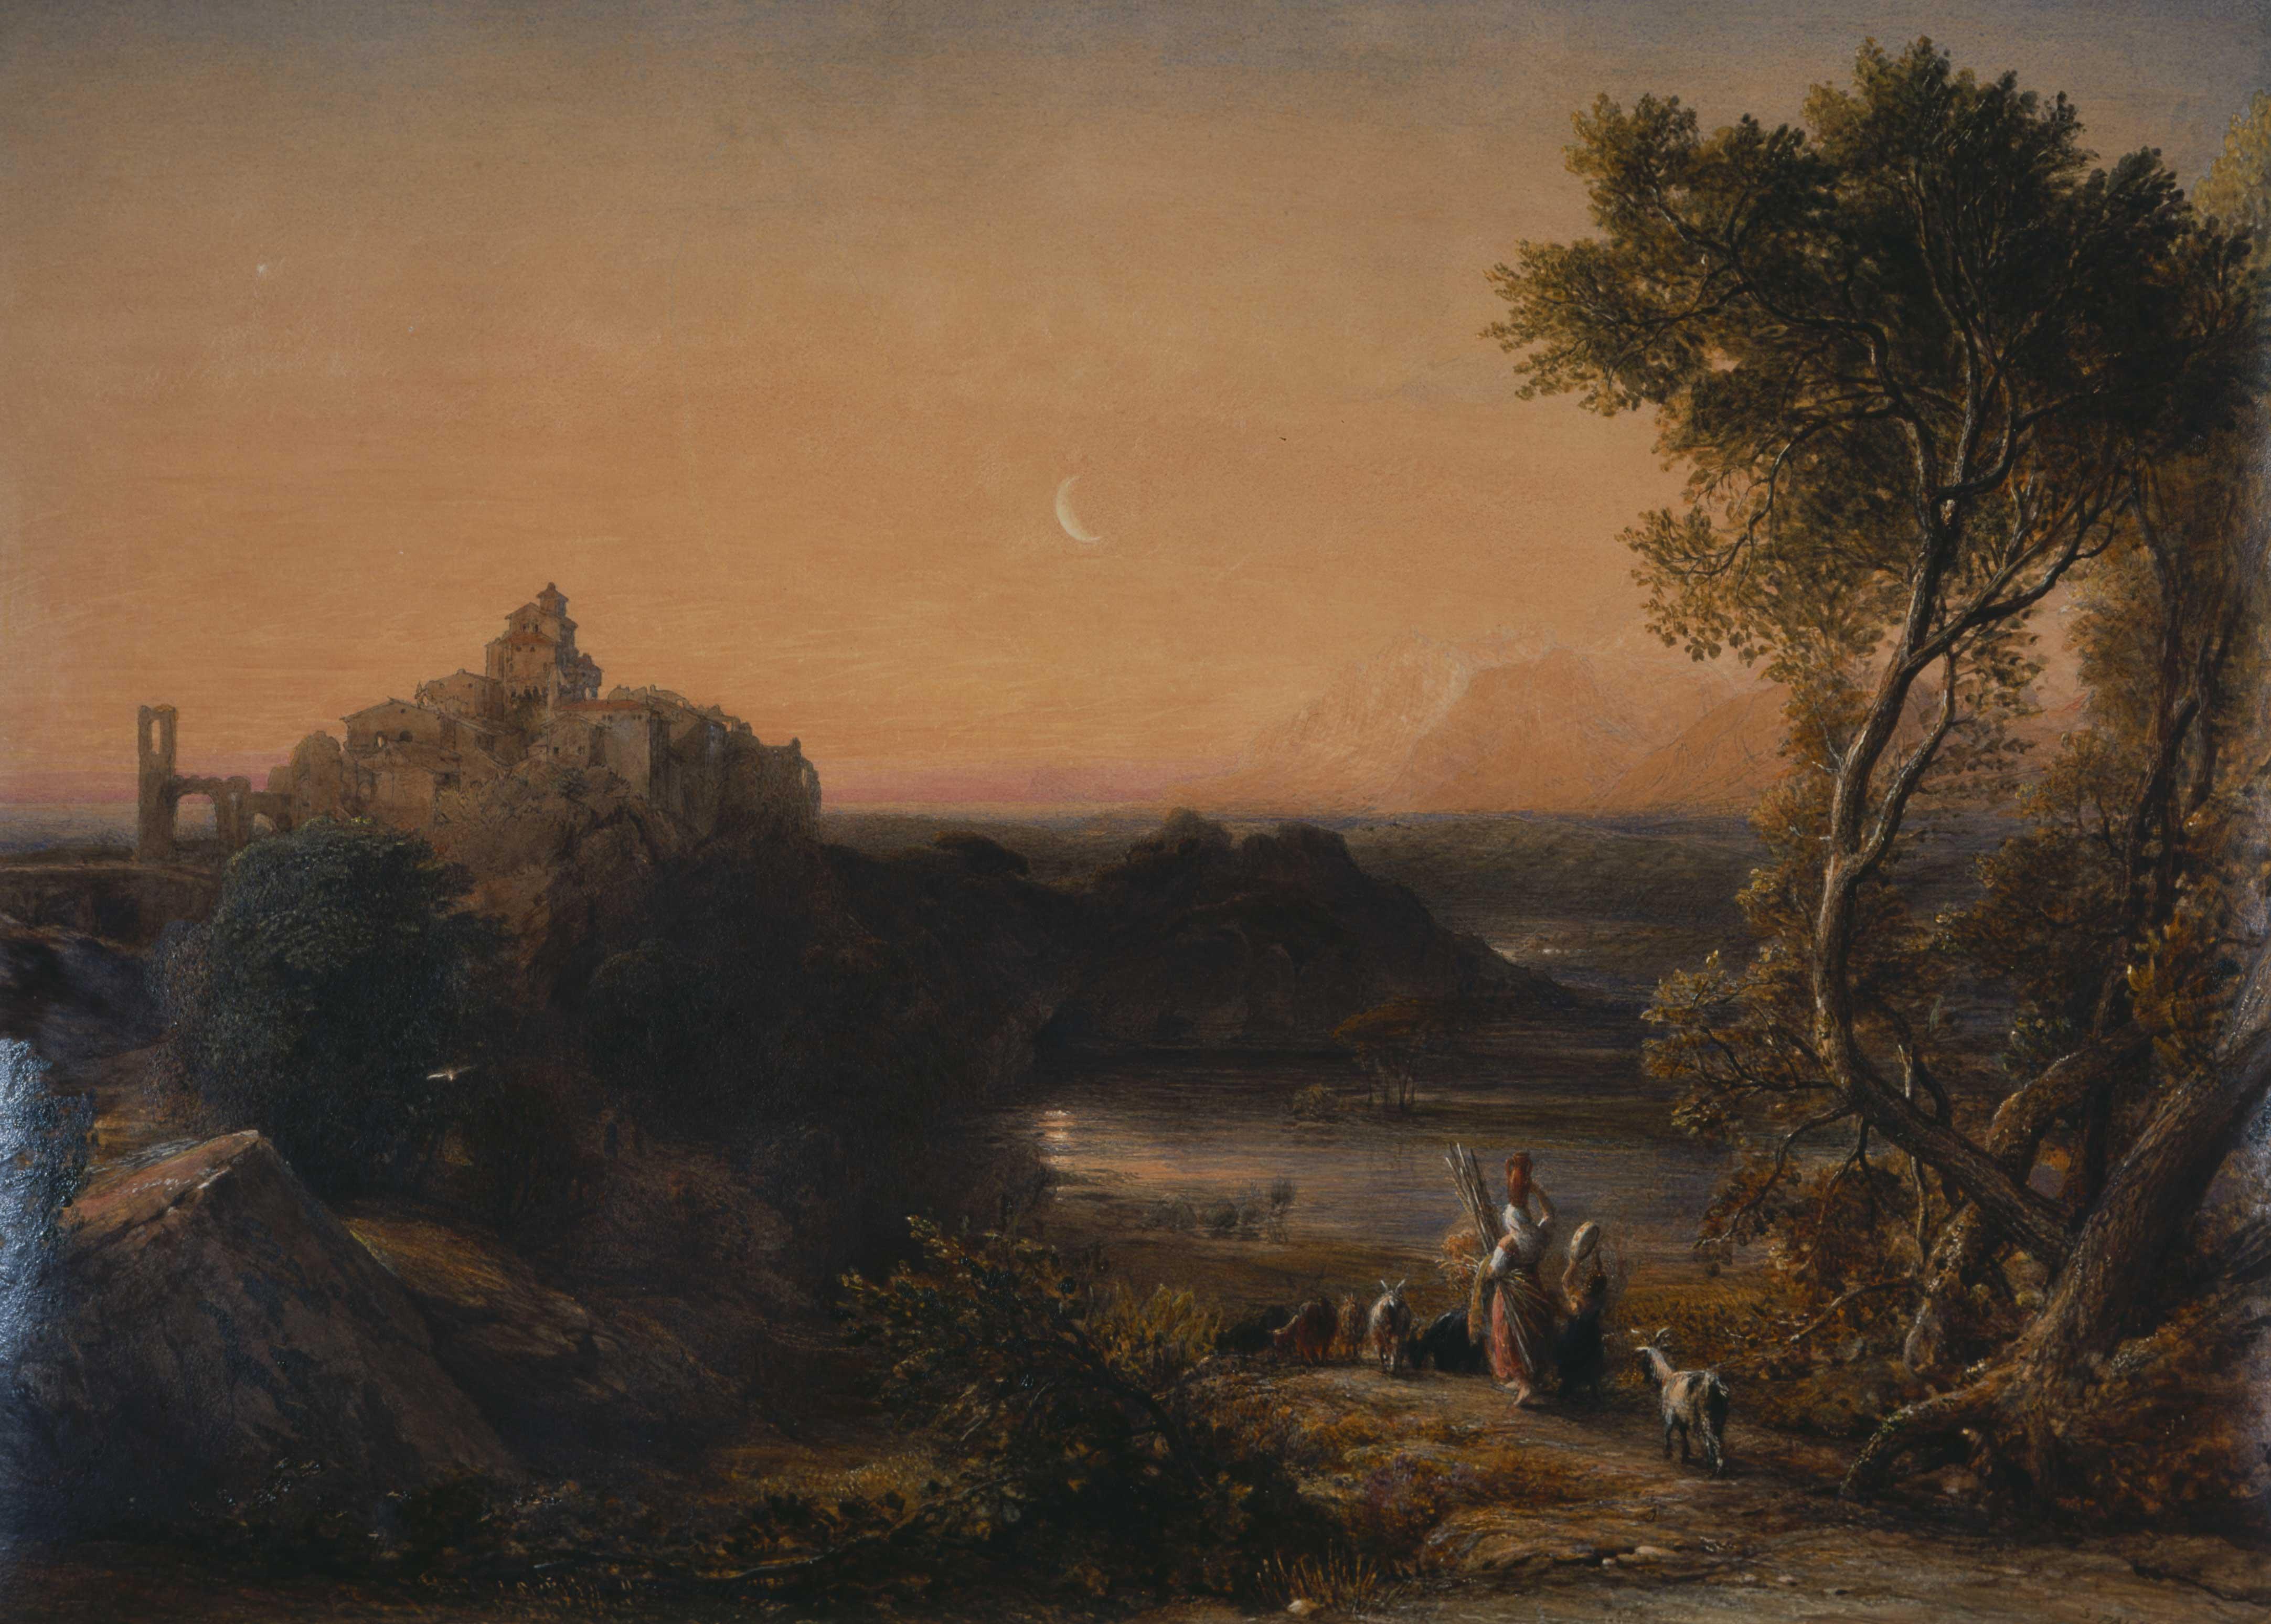 Papigno on the Nar, below the Falls of Terni